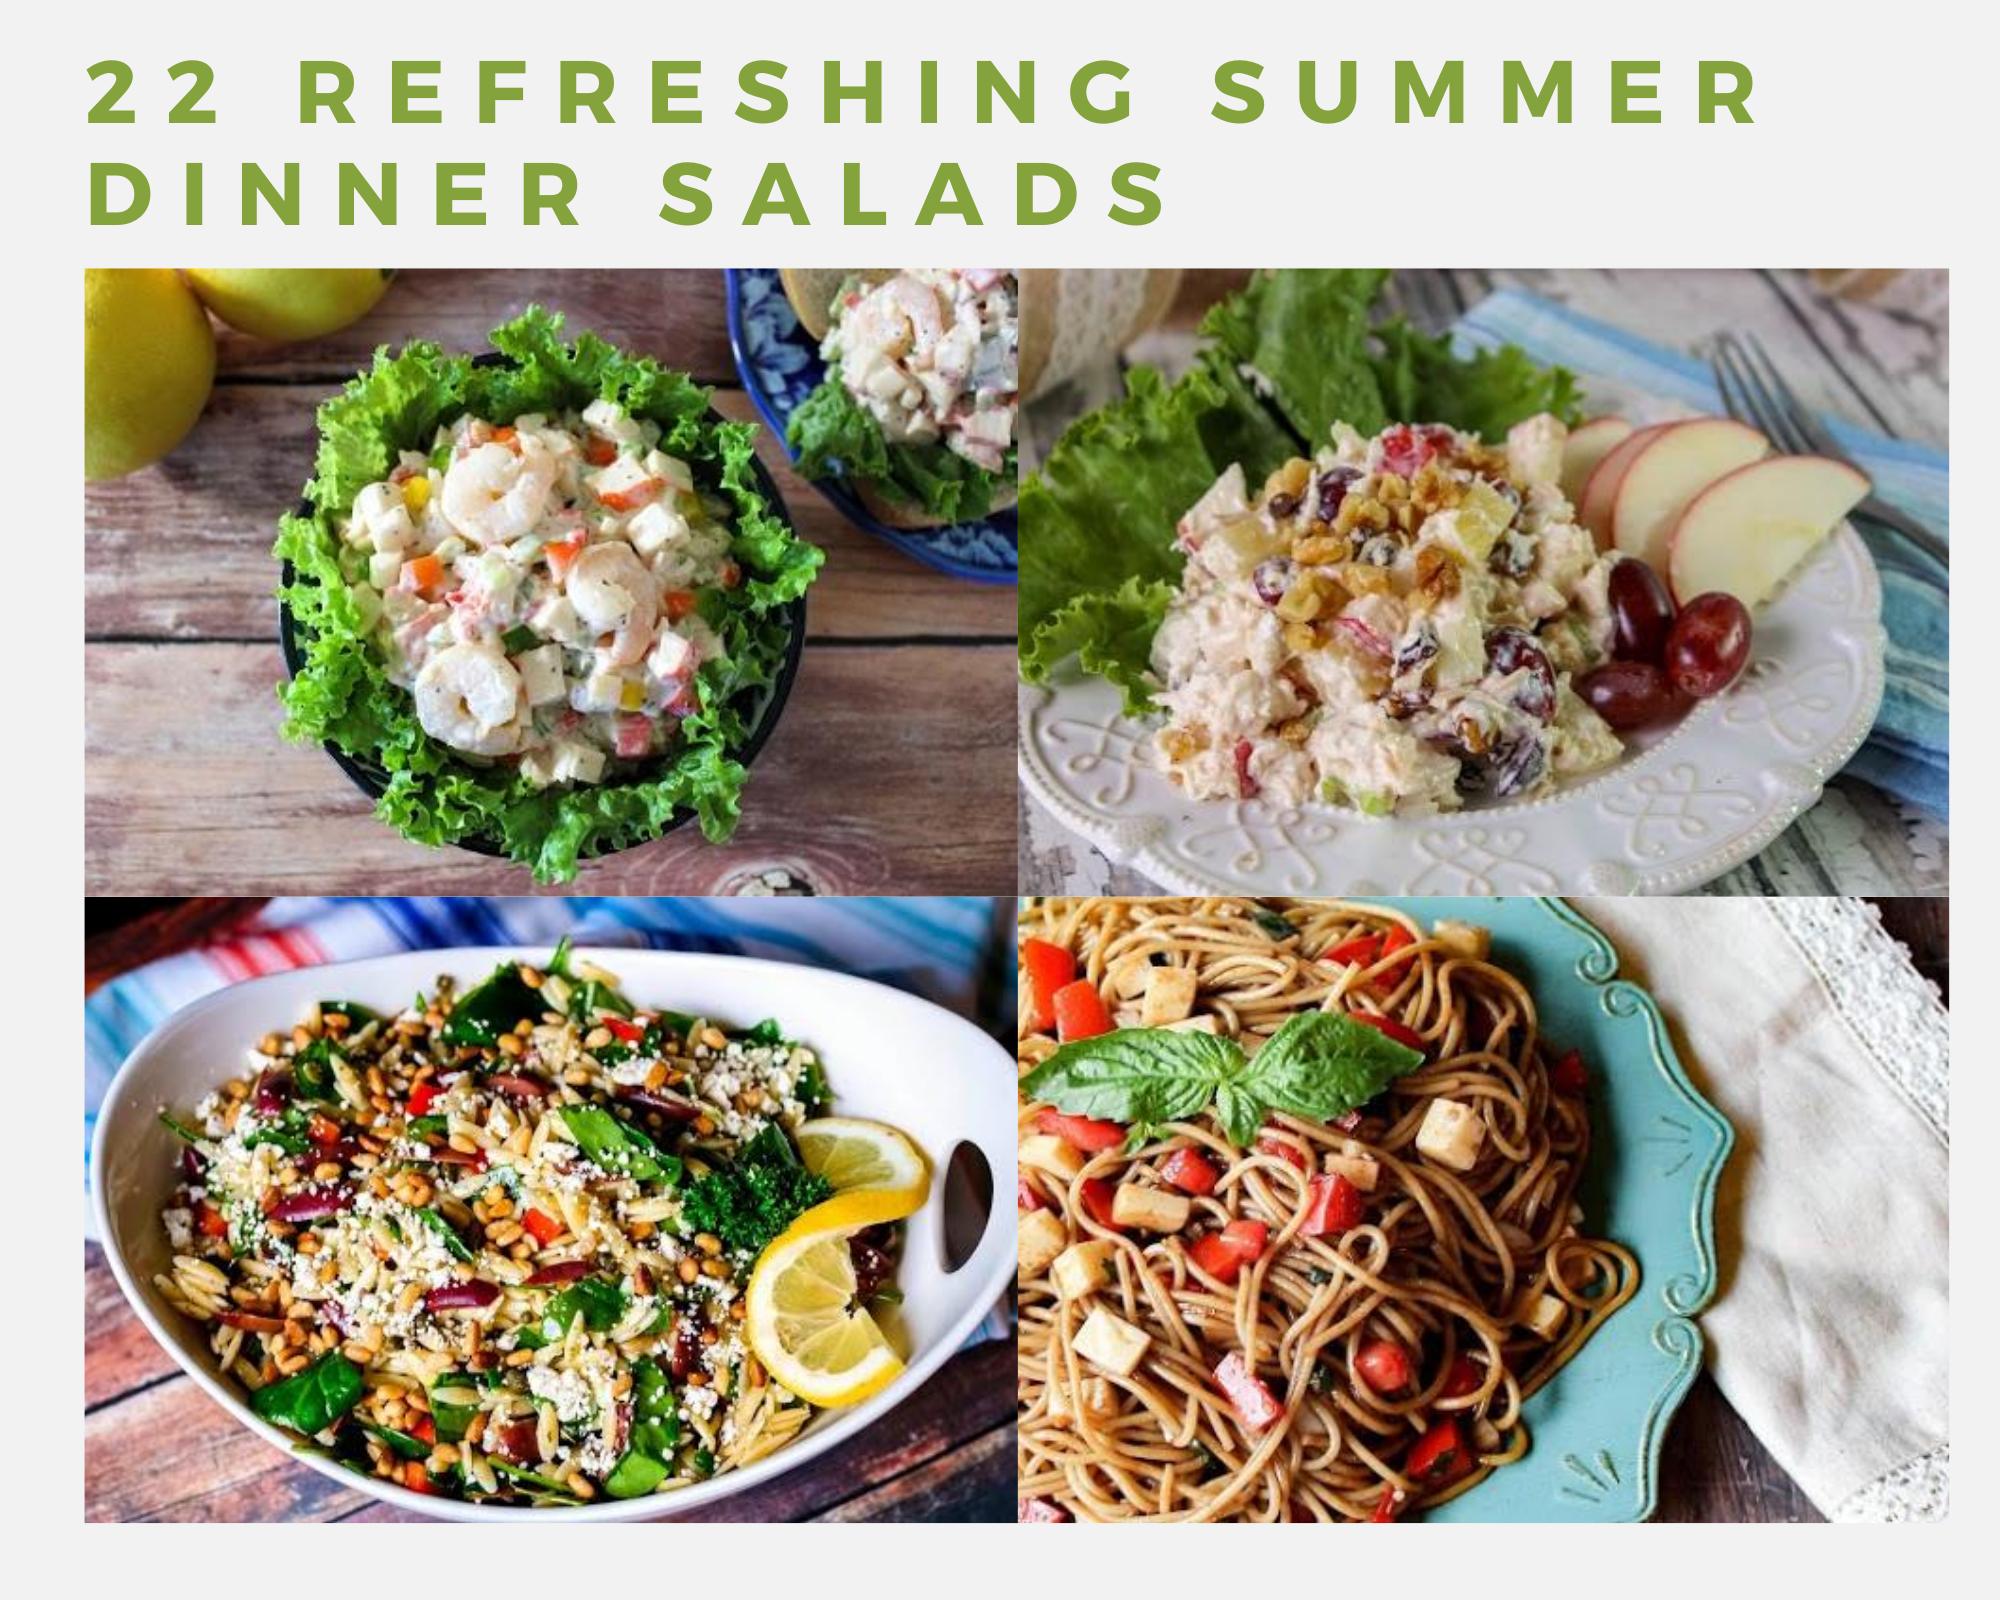 Pasta salad, seafood salad, chicken salad and orzo salad